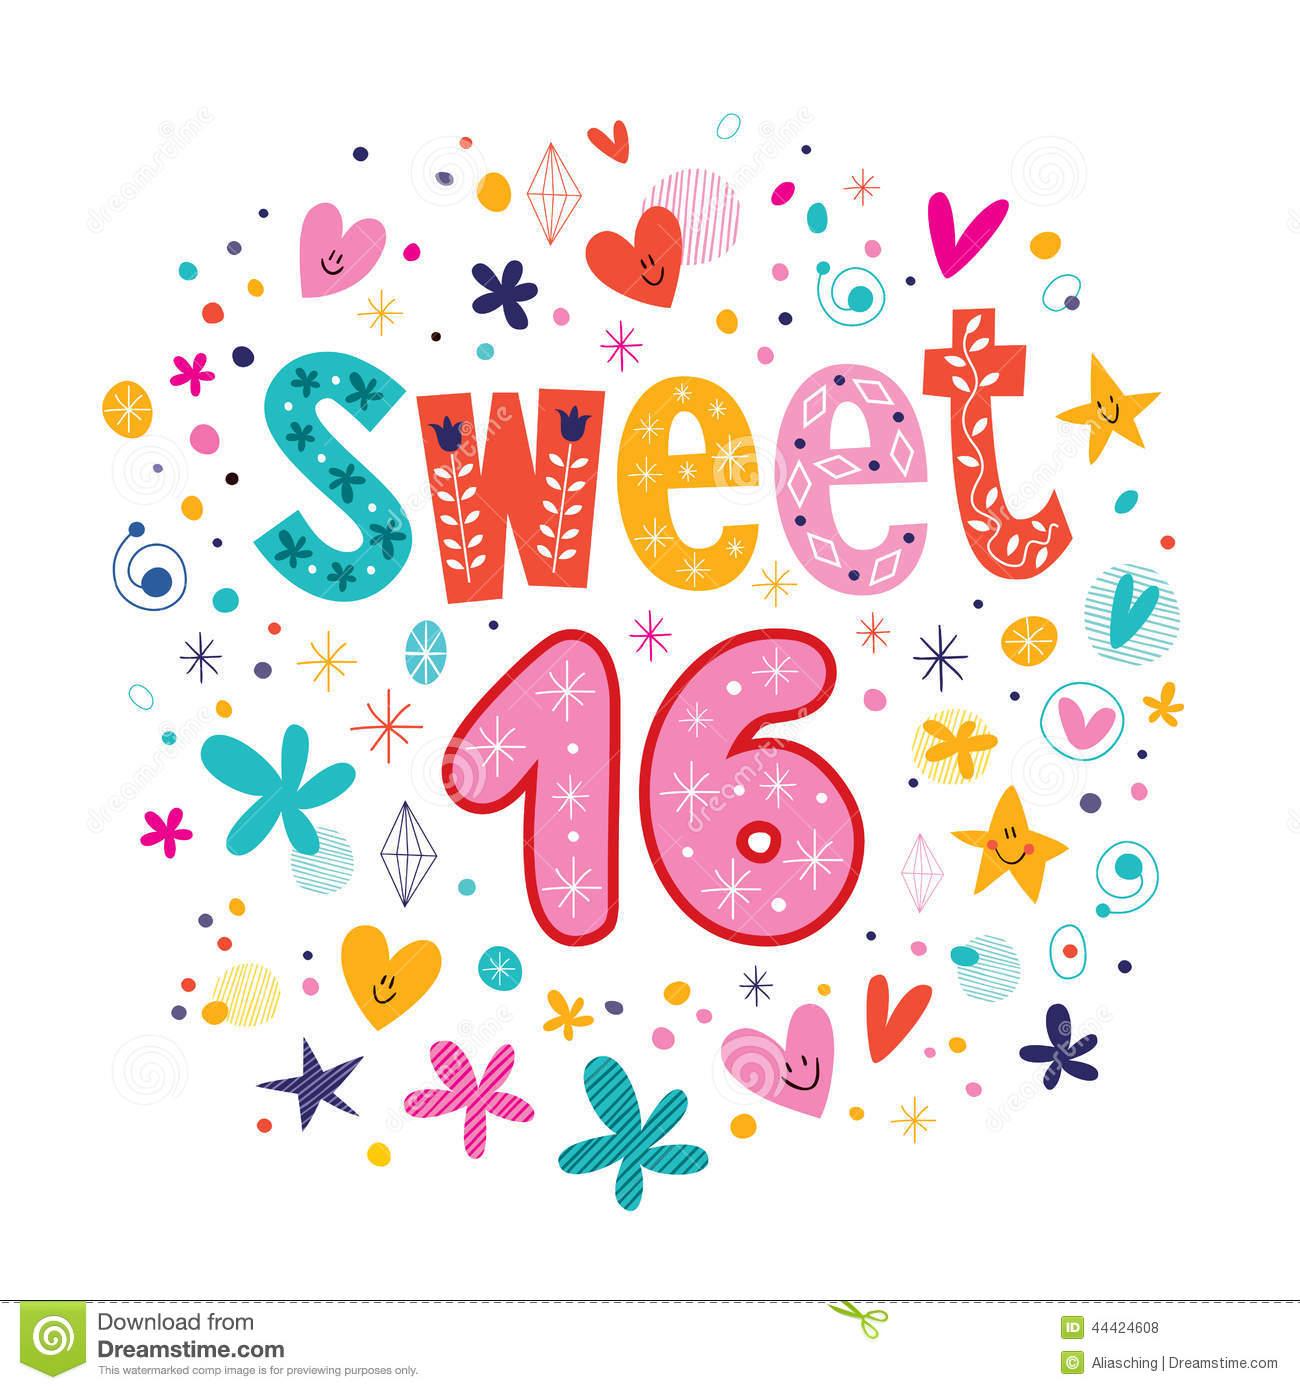 Sweet 16 Clipart 16th birthday clipart - clipart kid